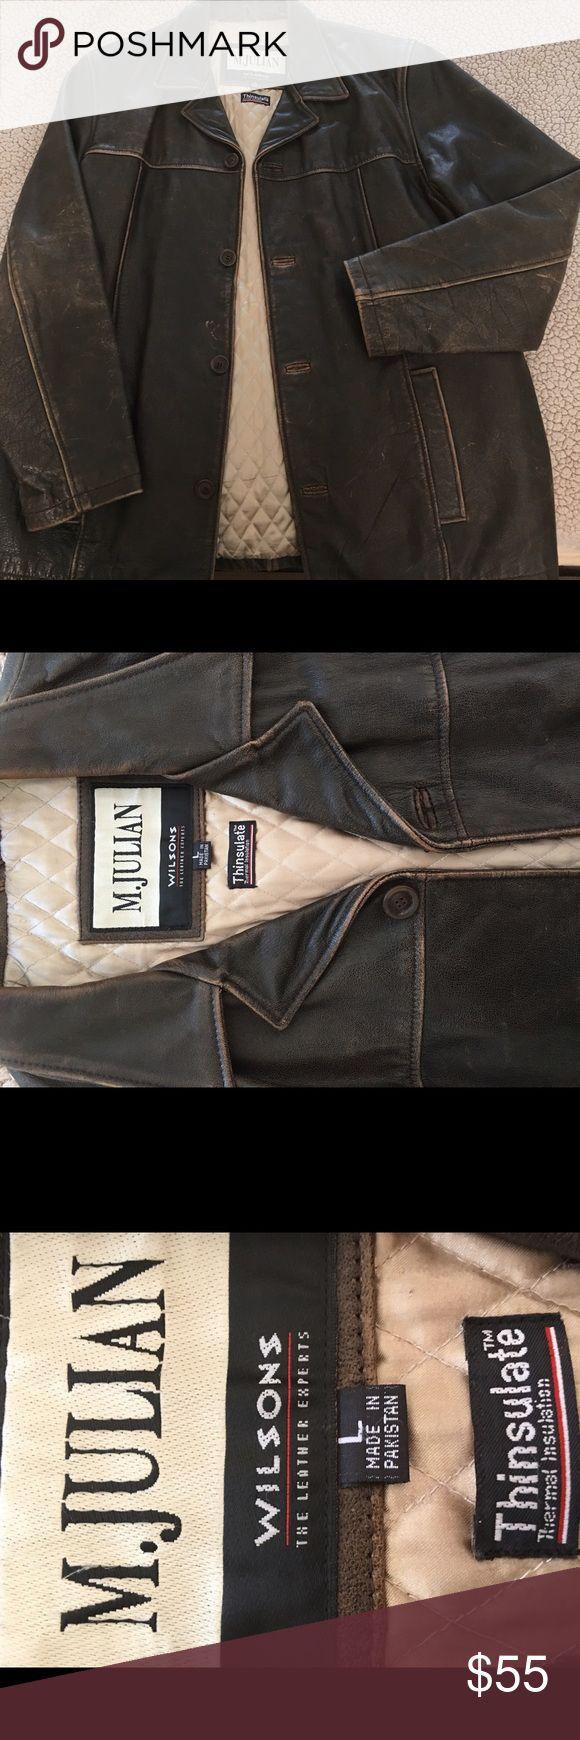 Men's leather jacket, color antique brown Men's leather jacket, antique brown, vintage brown, size Large, Wilson, motorcycle leather jacket Wilson Jackets & Coats Bomber & Varsity